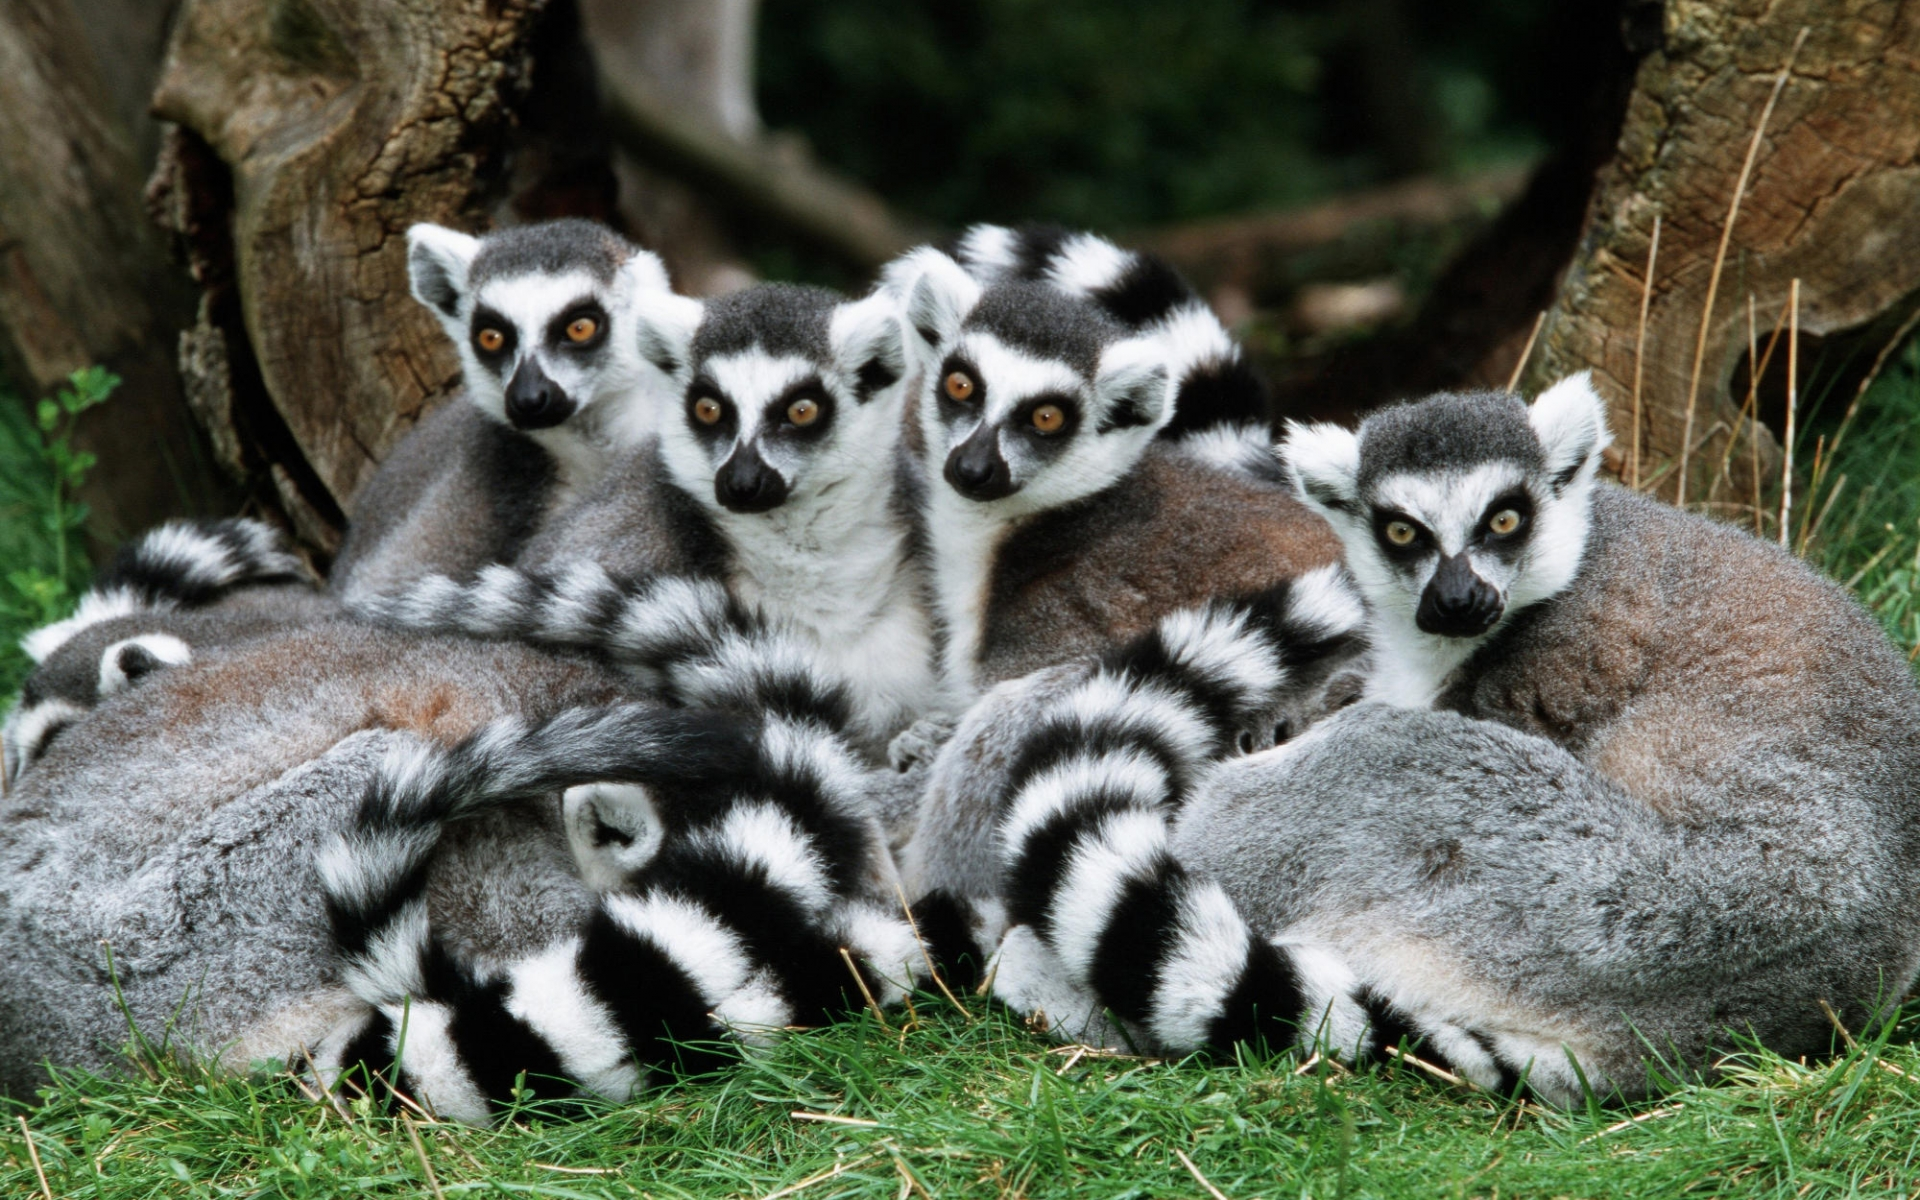 download wallpaper 3840x2160 lemur - photo #9